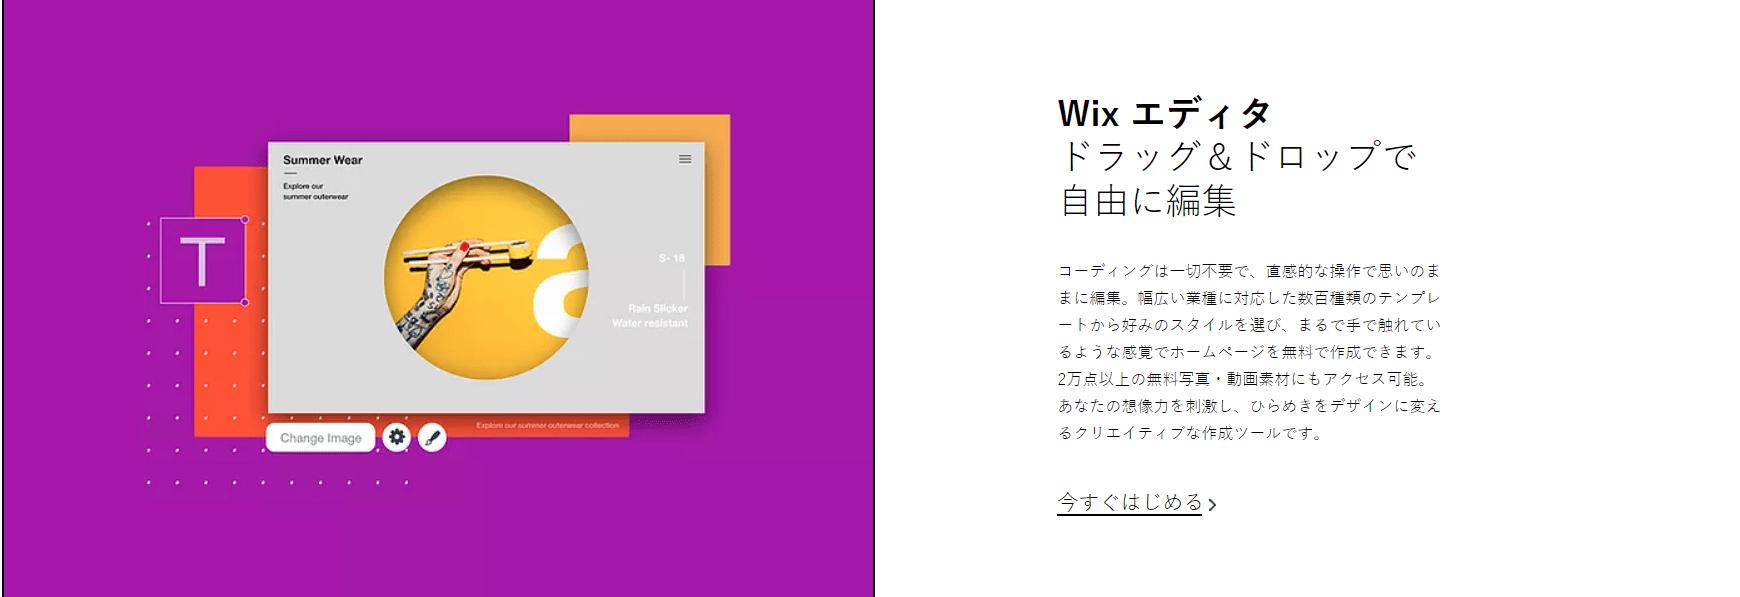 Adjusting site navigation and SEO settings on Wix